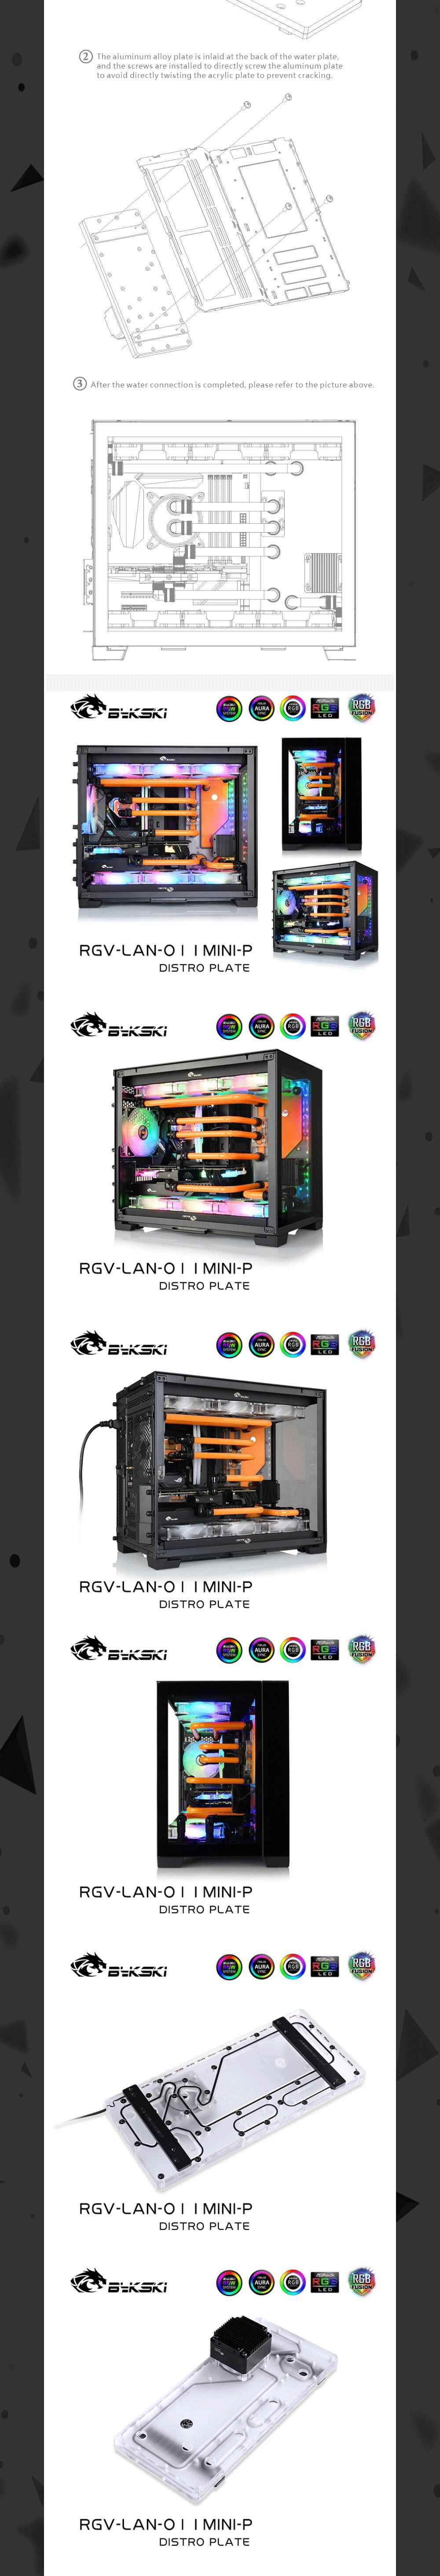 Bykski Waterway Cooling Kit For LIANLI O11Mini Case RBW For Intel CPU Water Block GPU Building, RGV-LAN-O11MINI-P